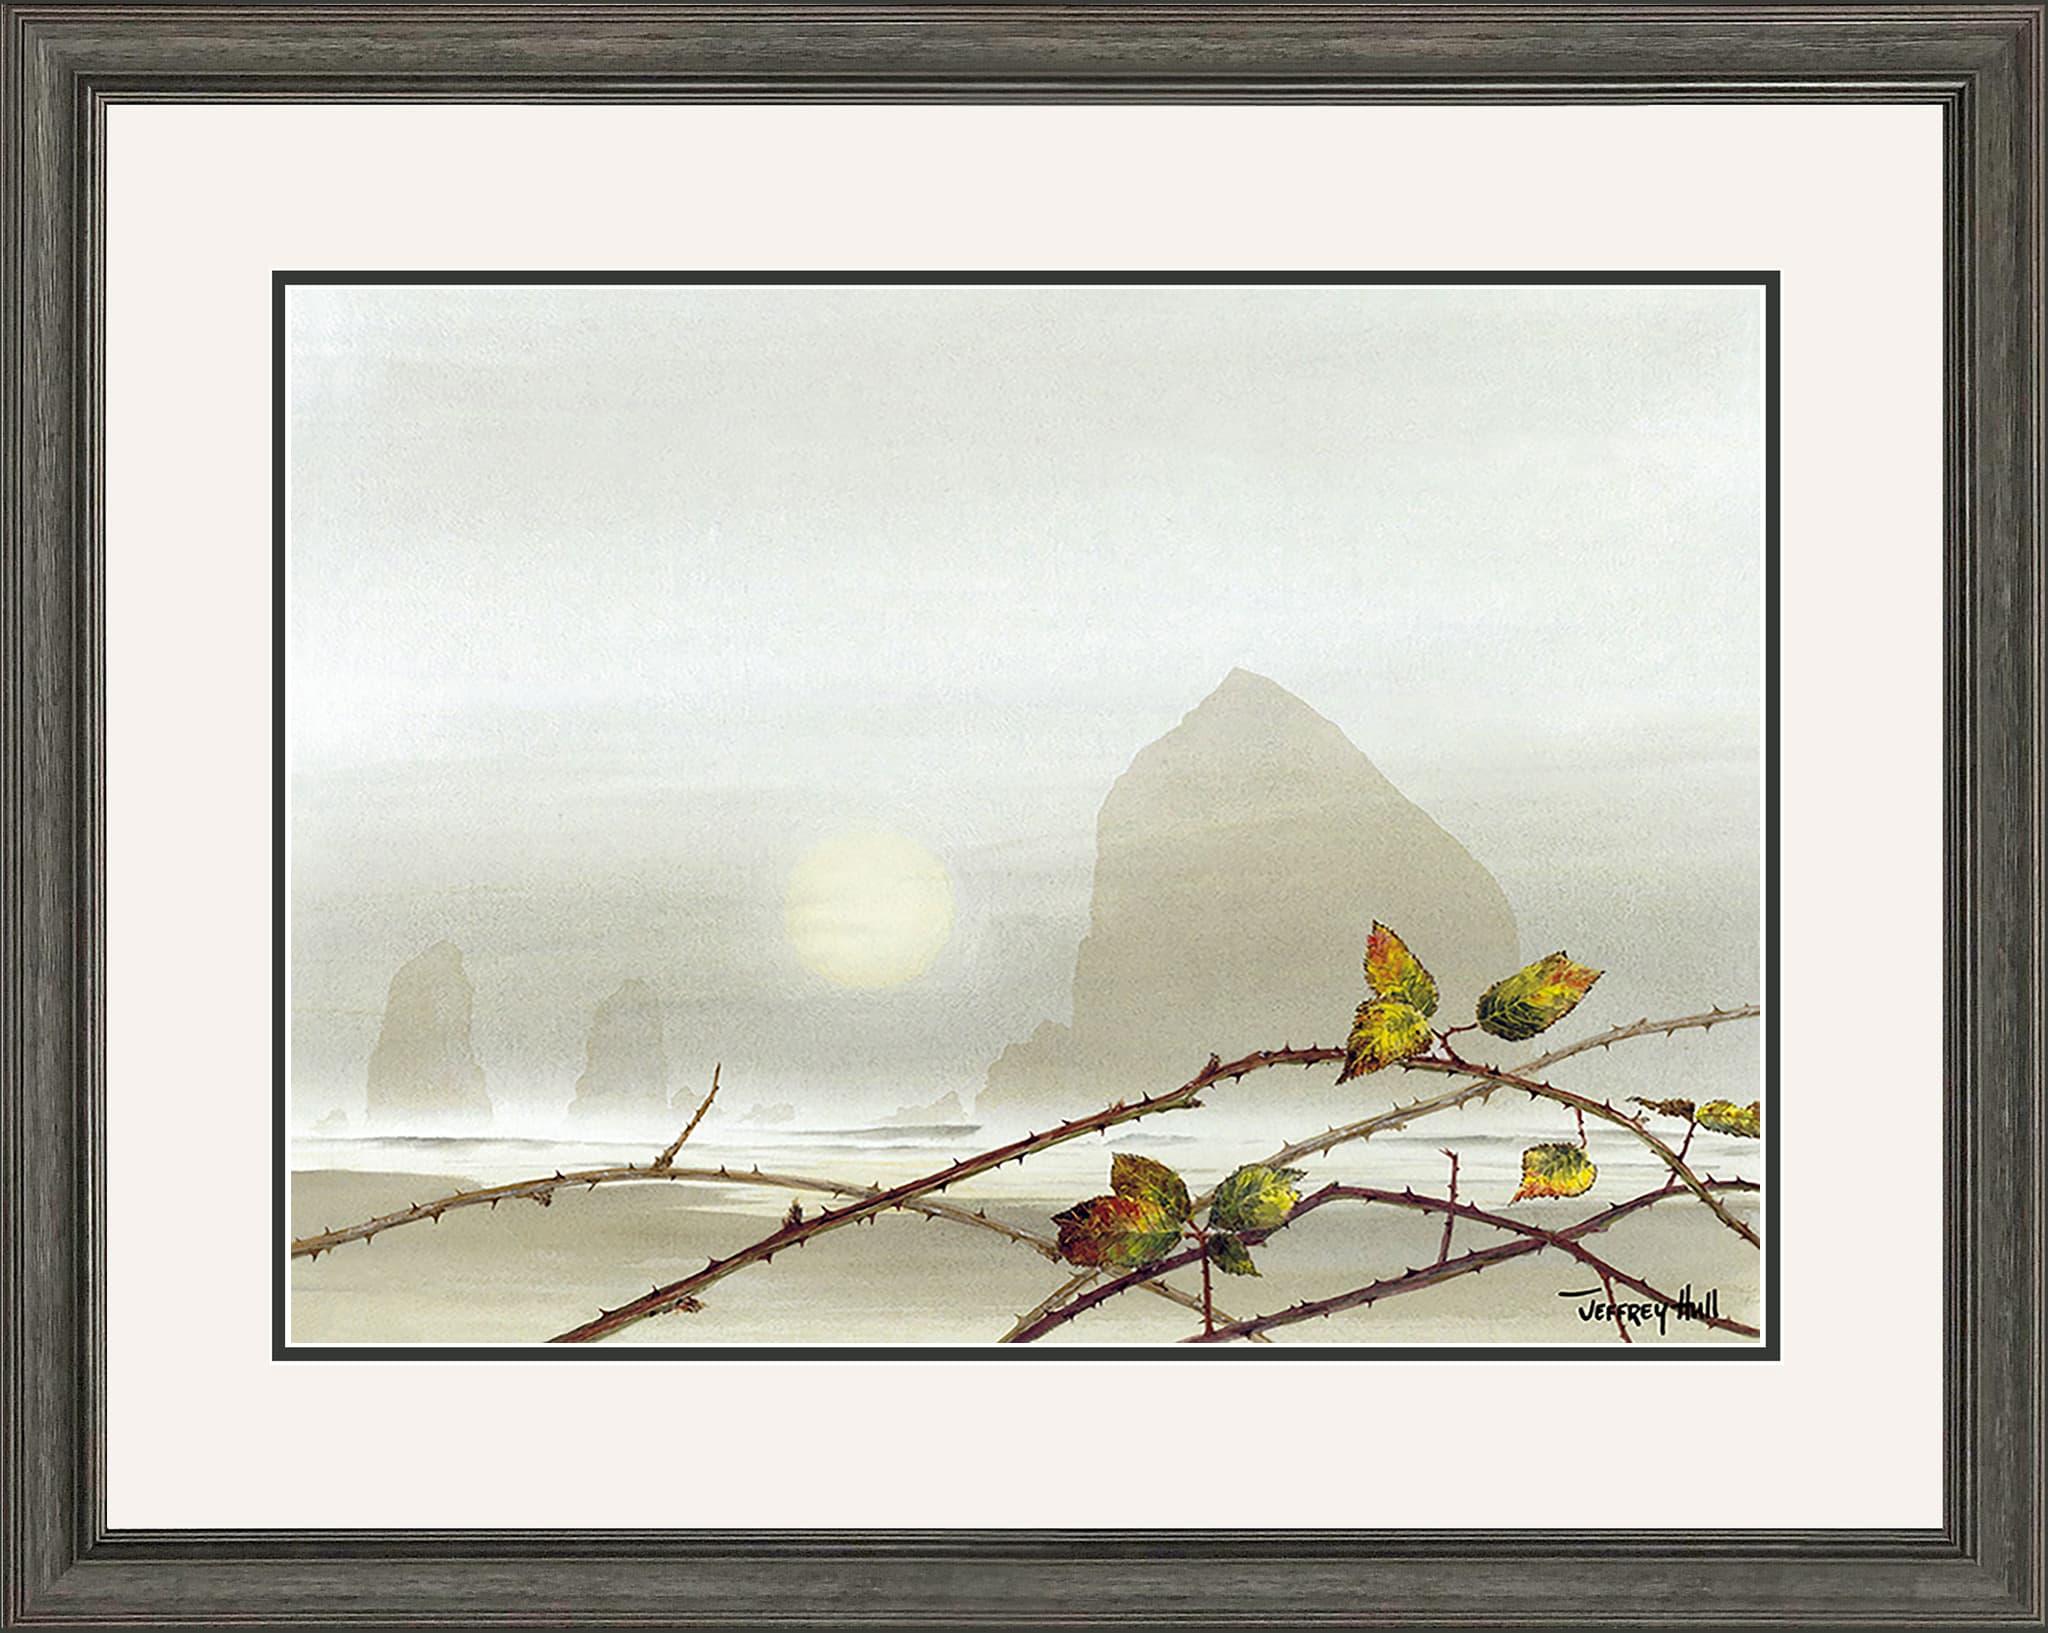 Bound-For-Winter-LimEd-Cascade-Talc-Dark-Shale-4-Website-2021